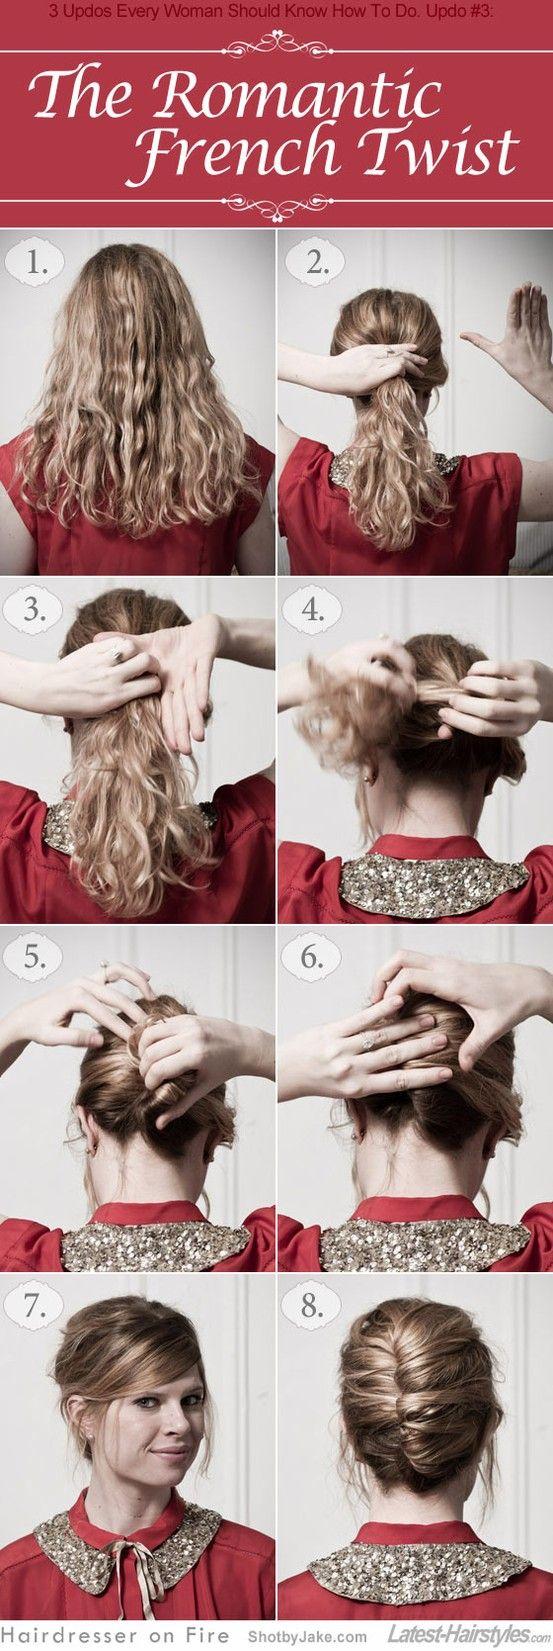 romantic french twist romantic french twist: Romantic French, Hairstyles, French Twists, Hair Styles, Hair Tutorial, French Twist, Updo